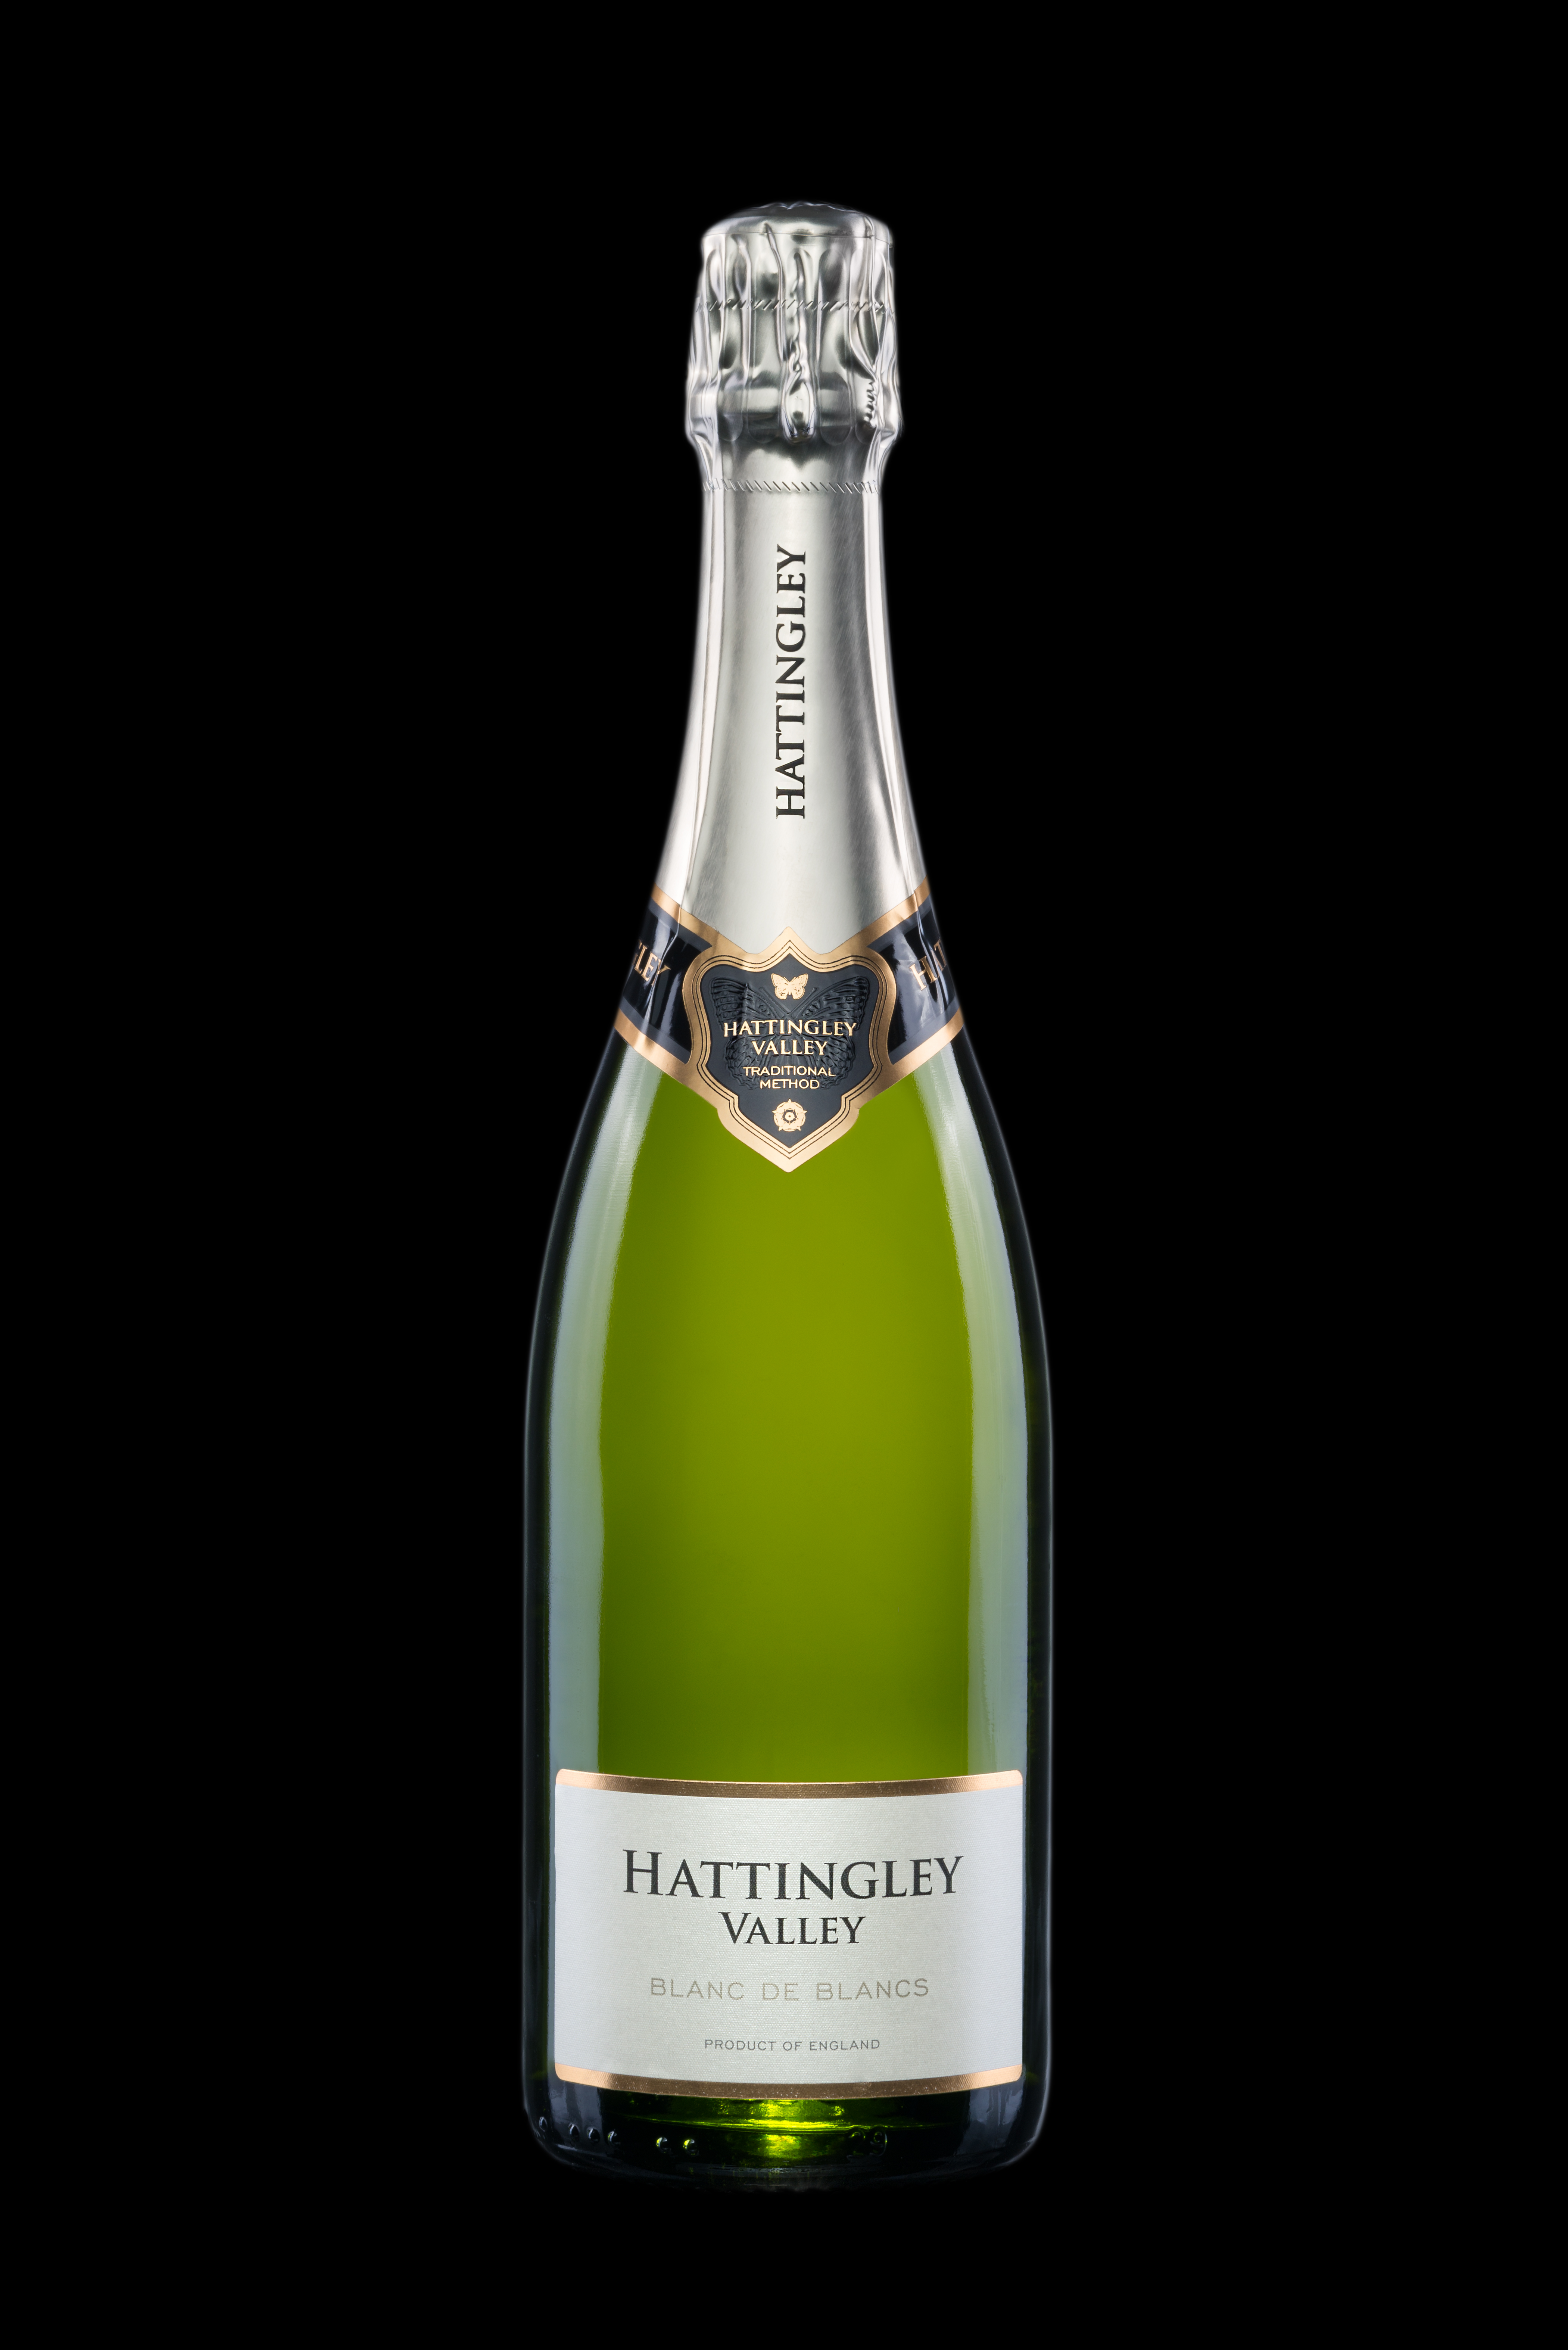 Hattingley Valley Blanc De Blancs_black